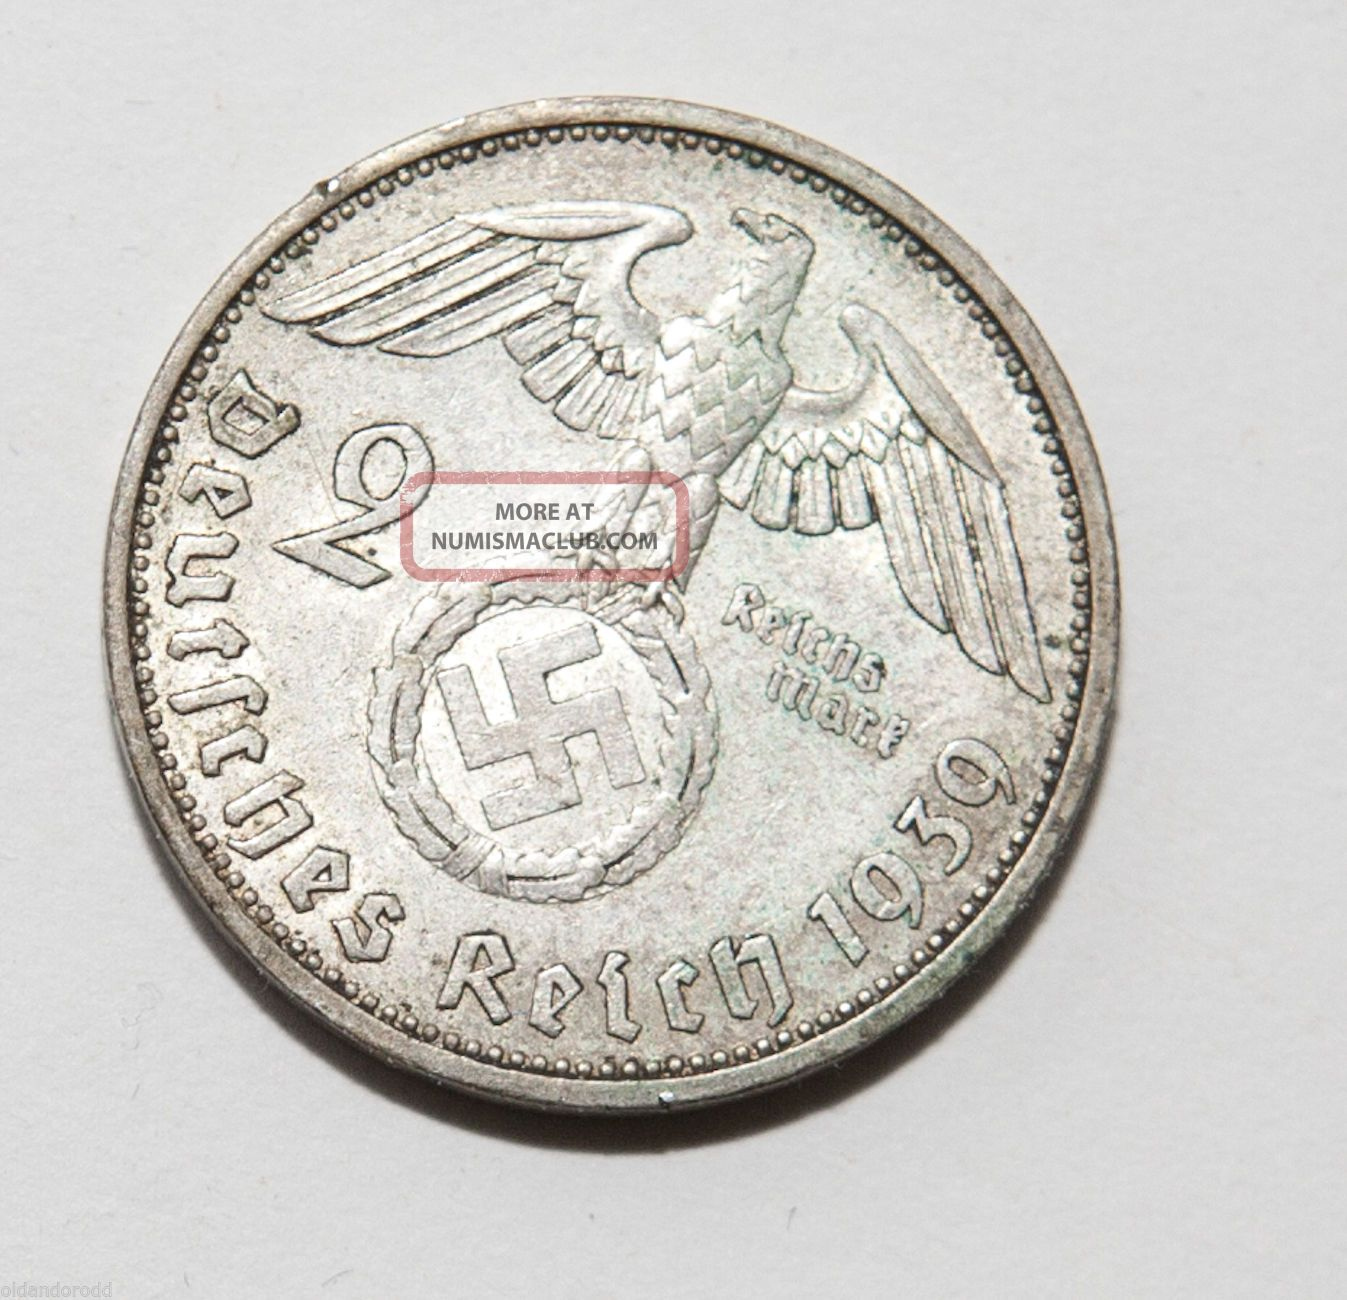 Rare 1939 A Hindenburg Swastika 2 Mark Silver Coin Germany photo